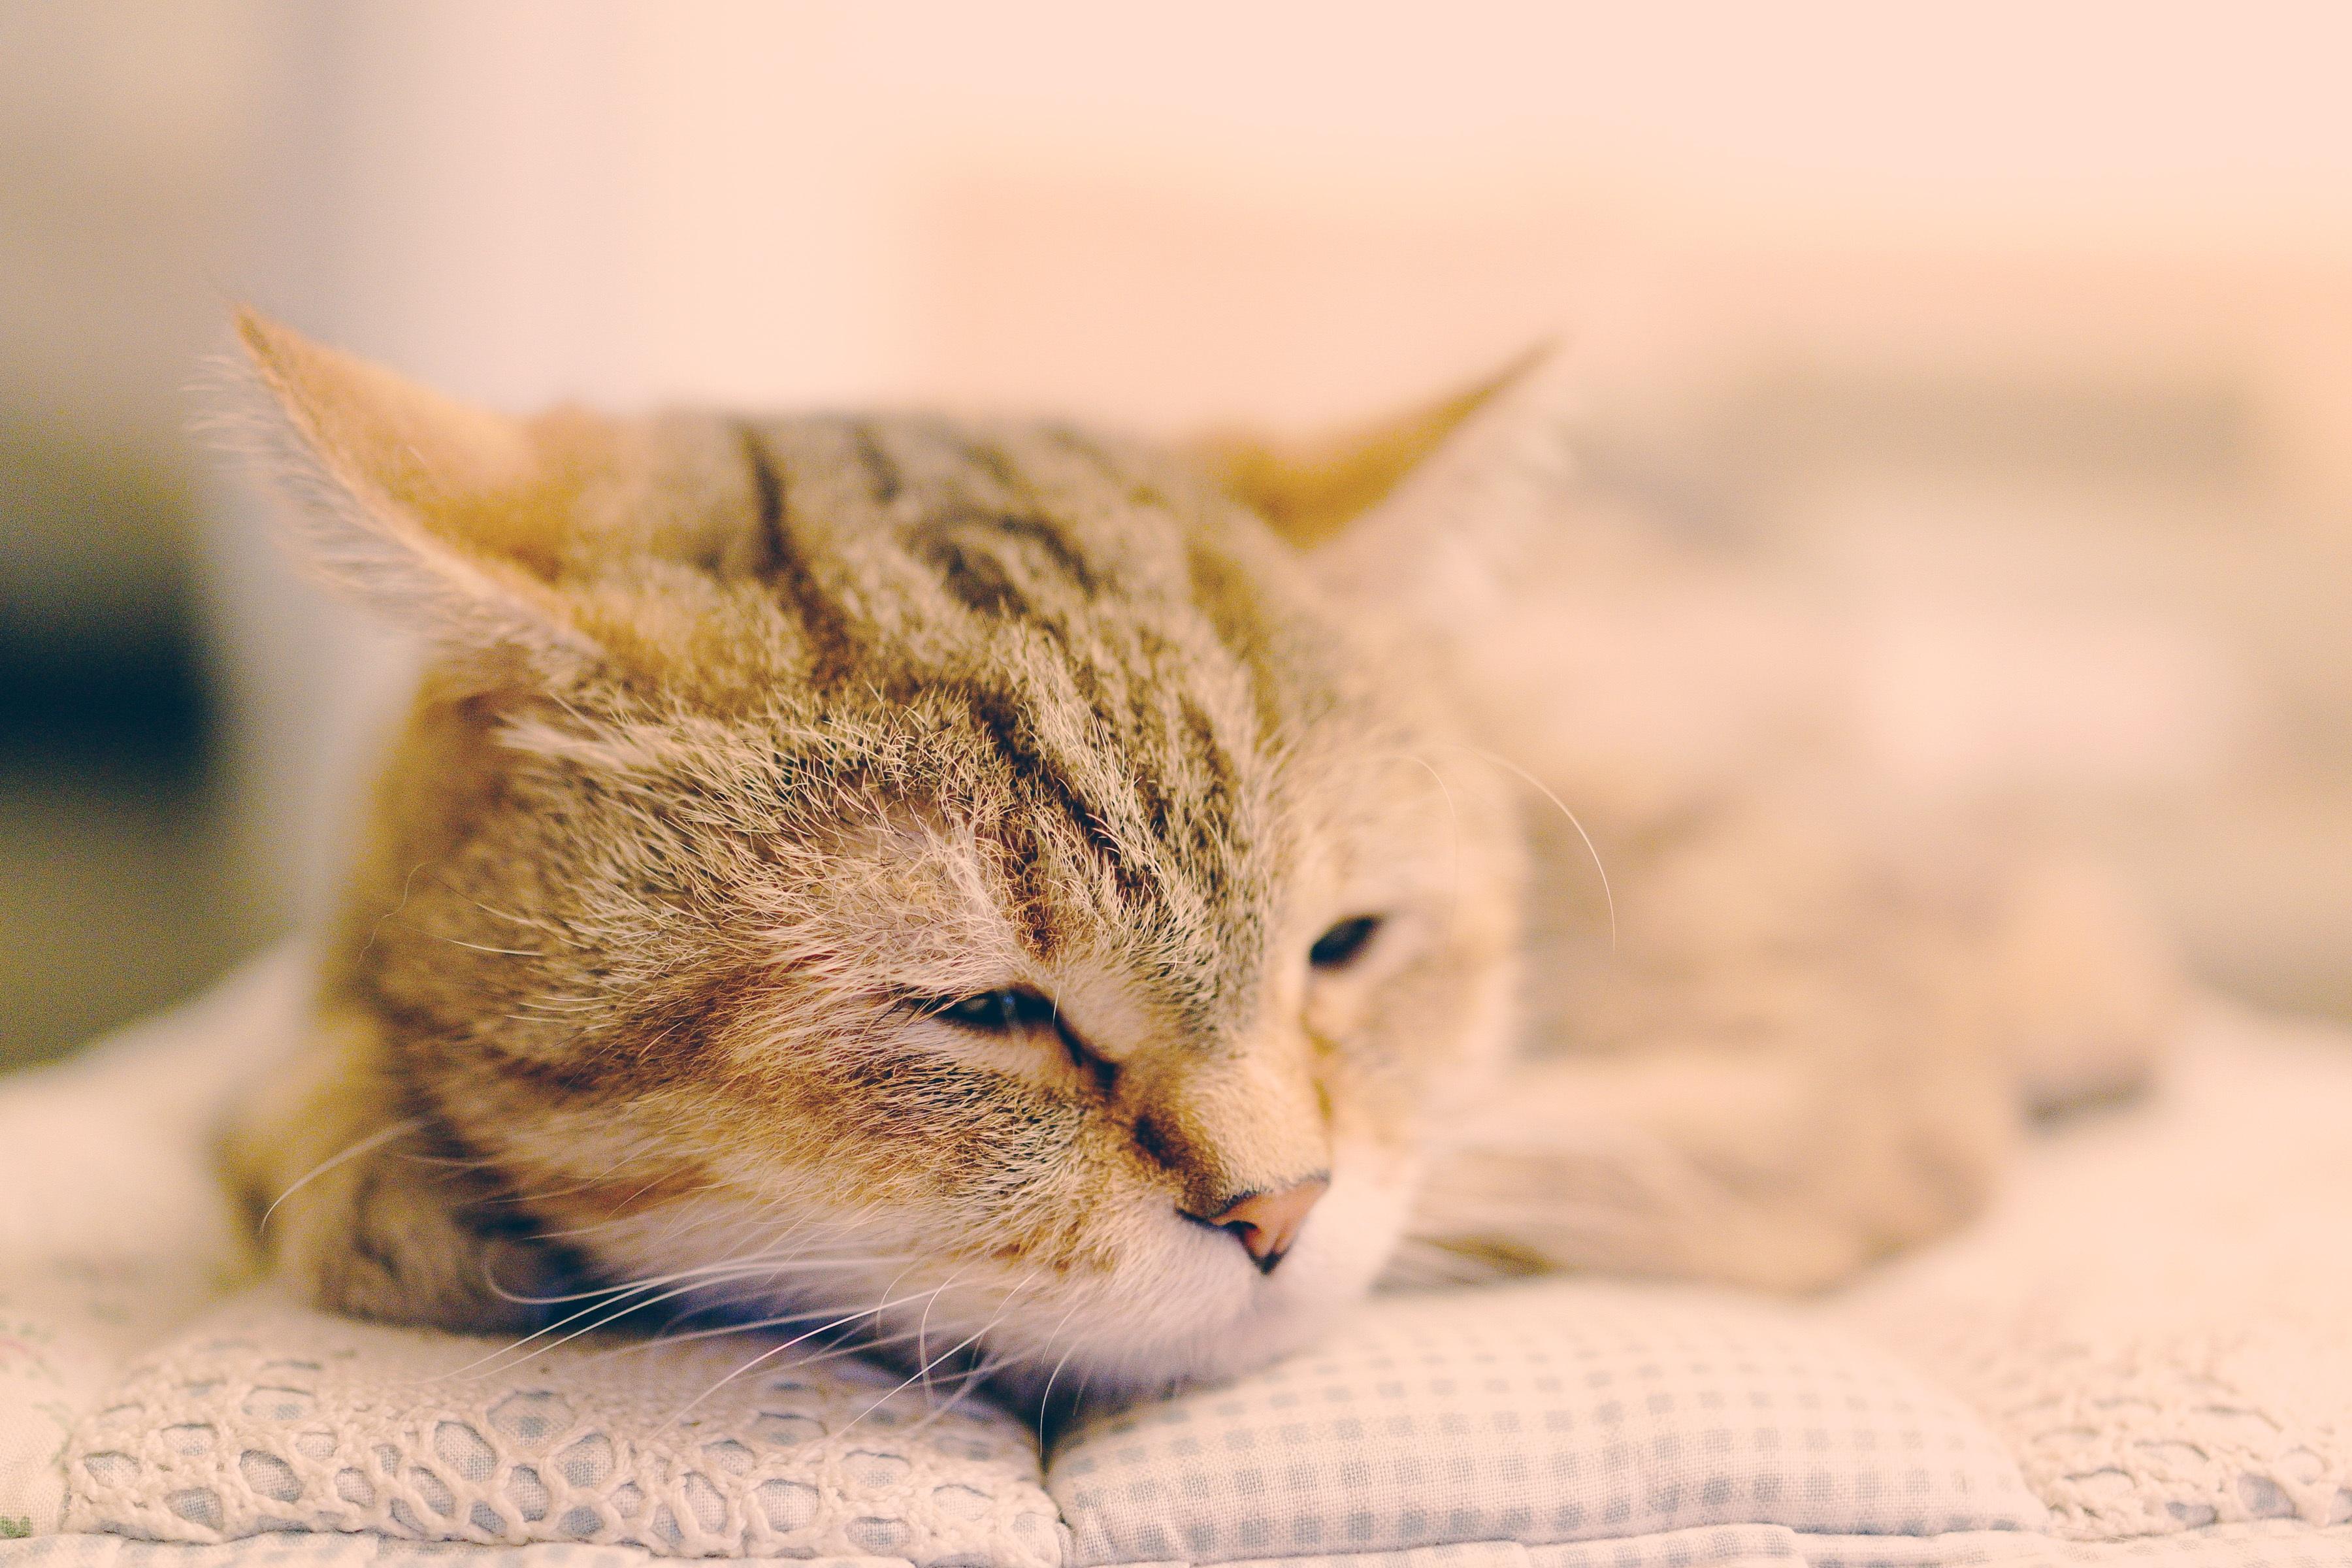 kostenlose foto haustier k tzchen fauna nahansicht nase whiskers haut wirbeltier tabby. Black Bedroom Furniture Sets. Home Design Ideas